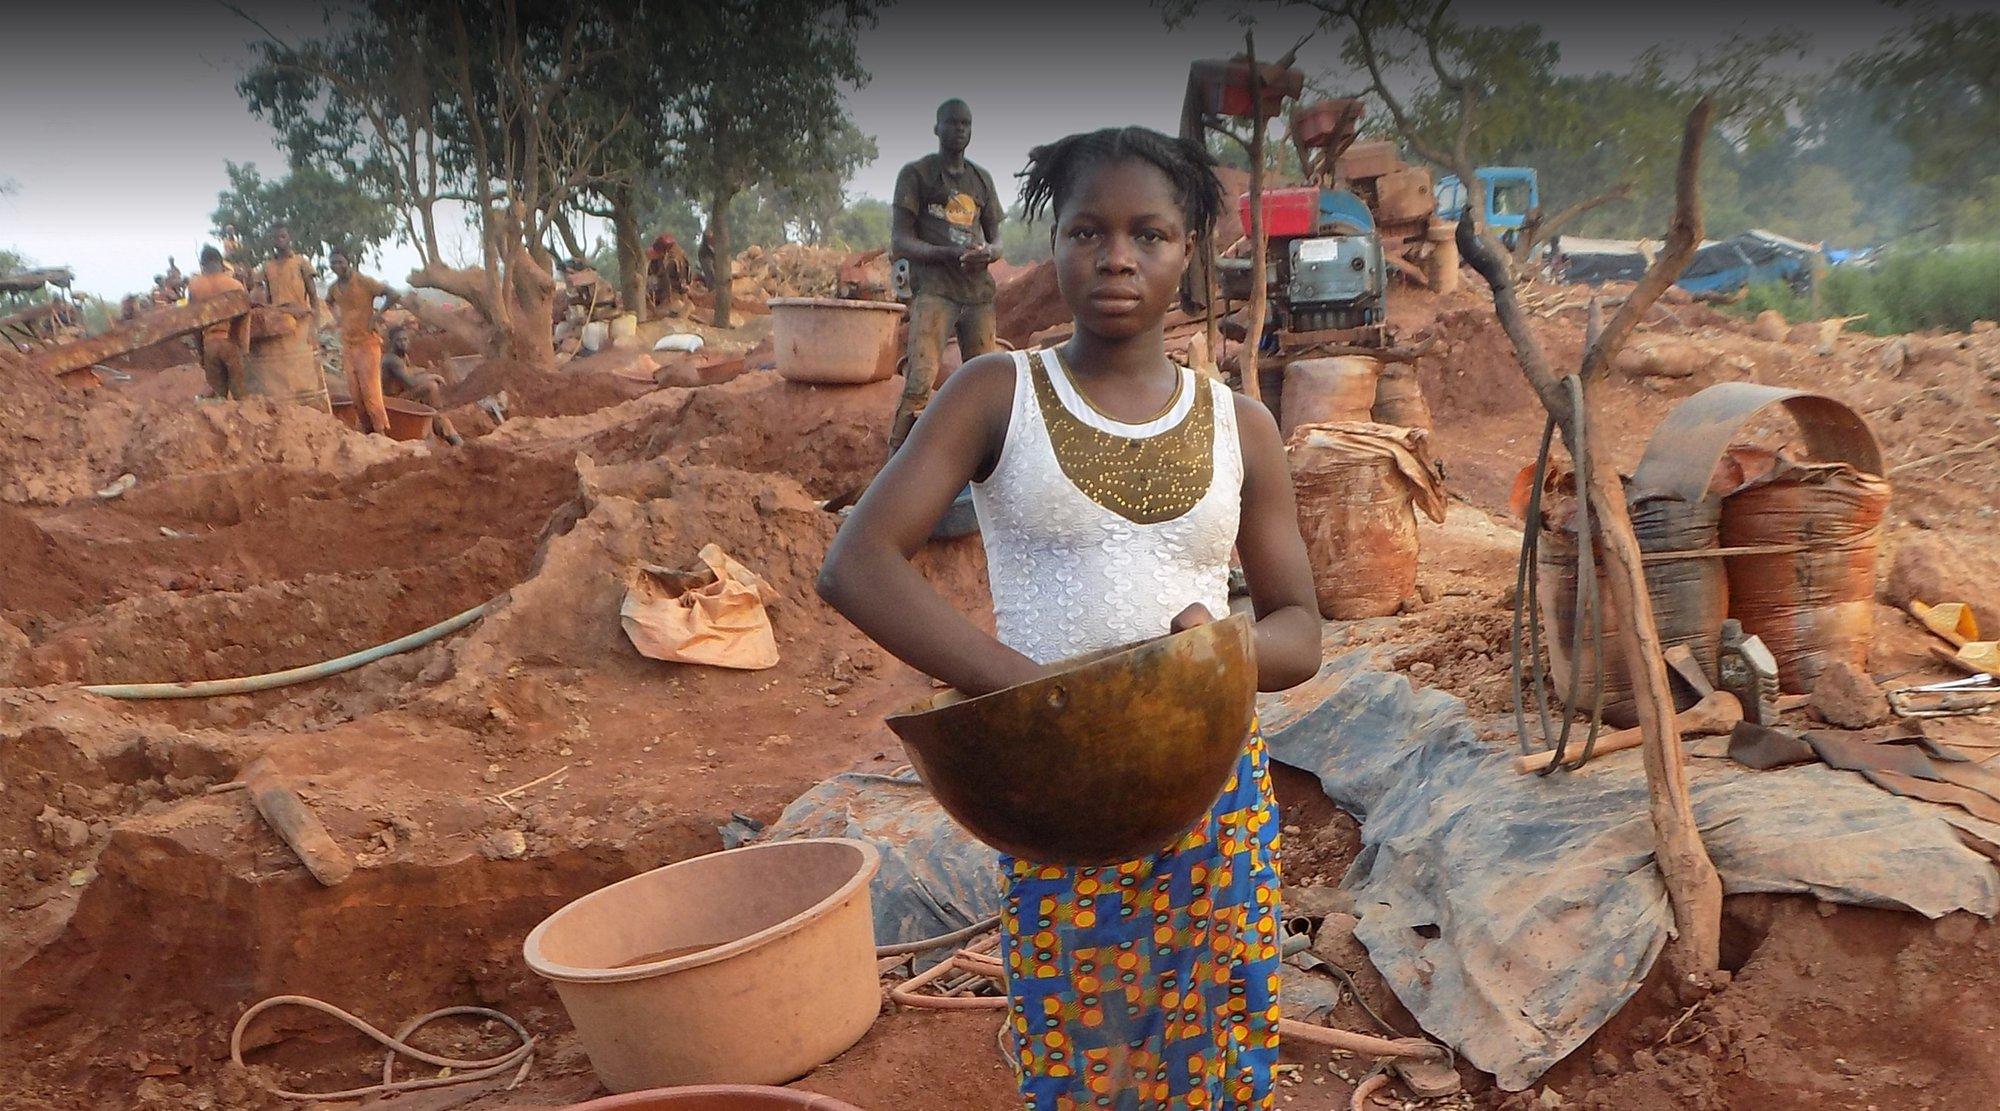 Child Labour Day Acquisition Campaign - Image 1- Web Hero.jpg